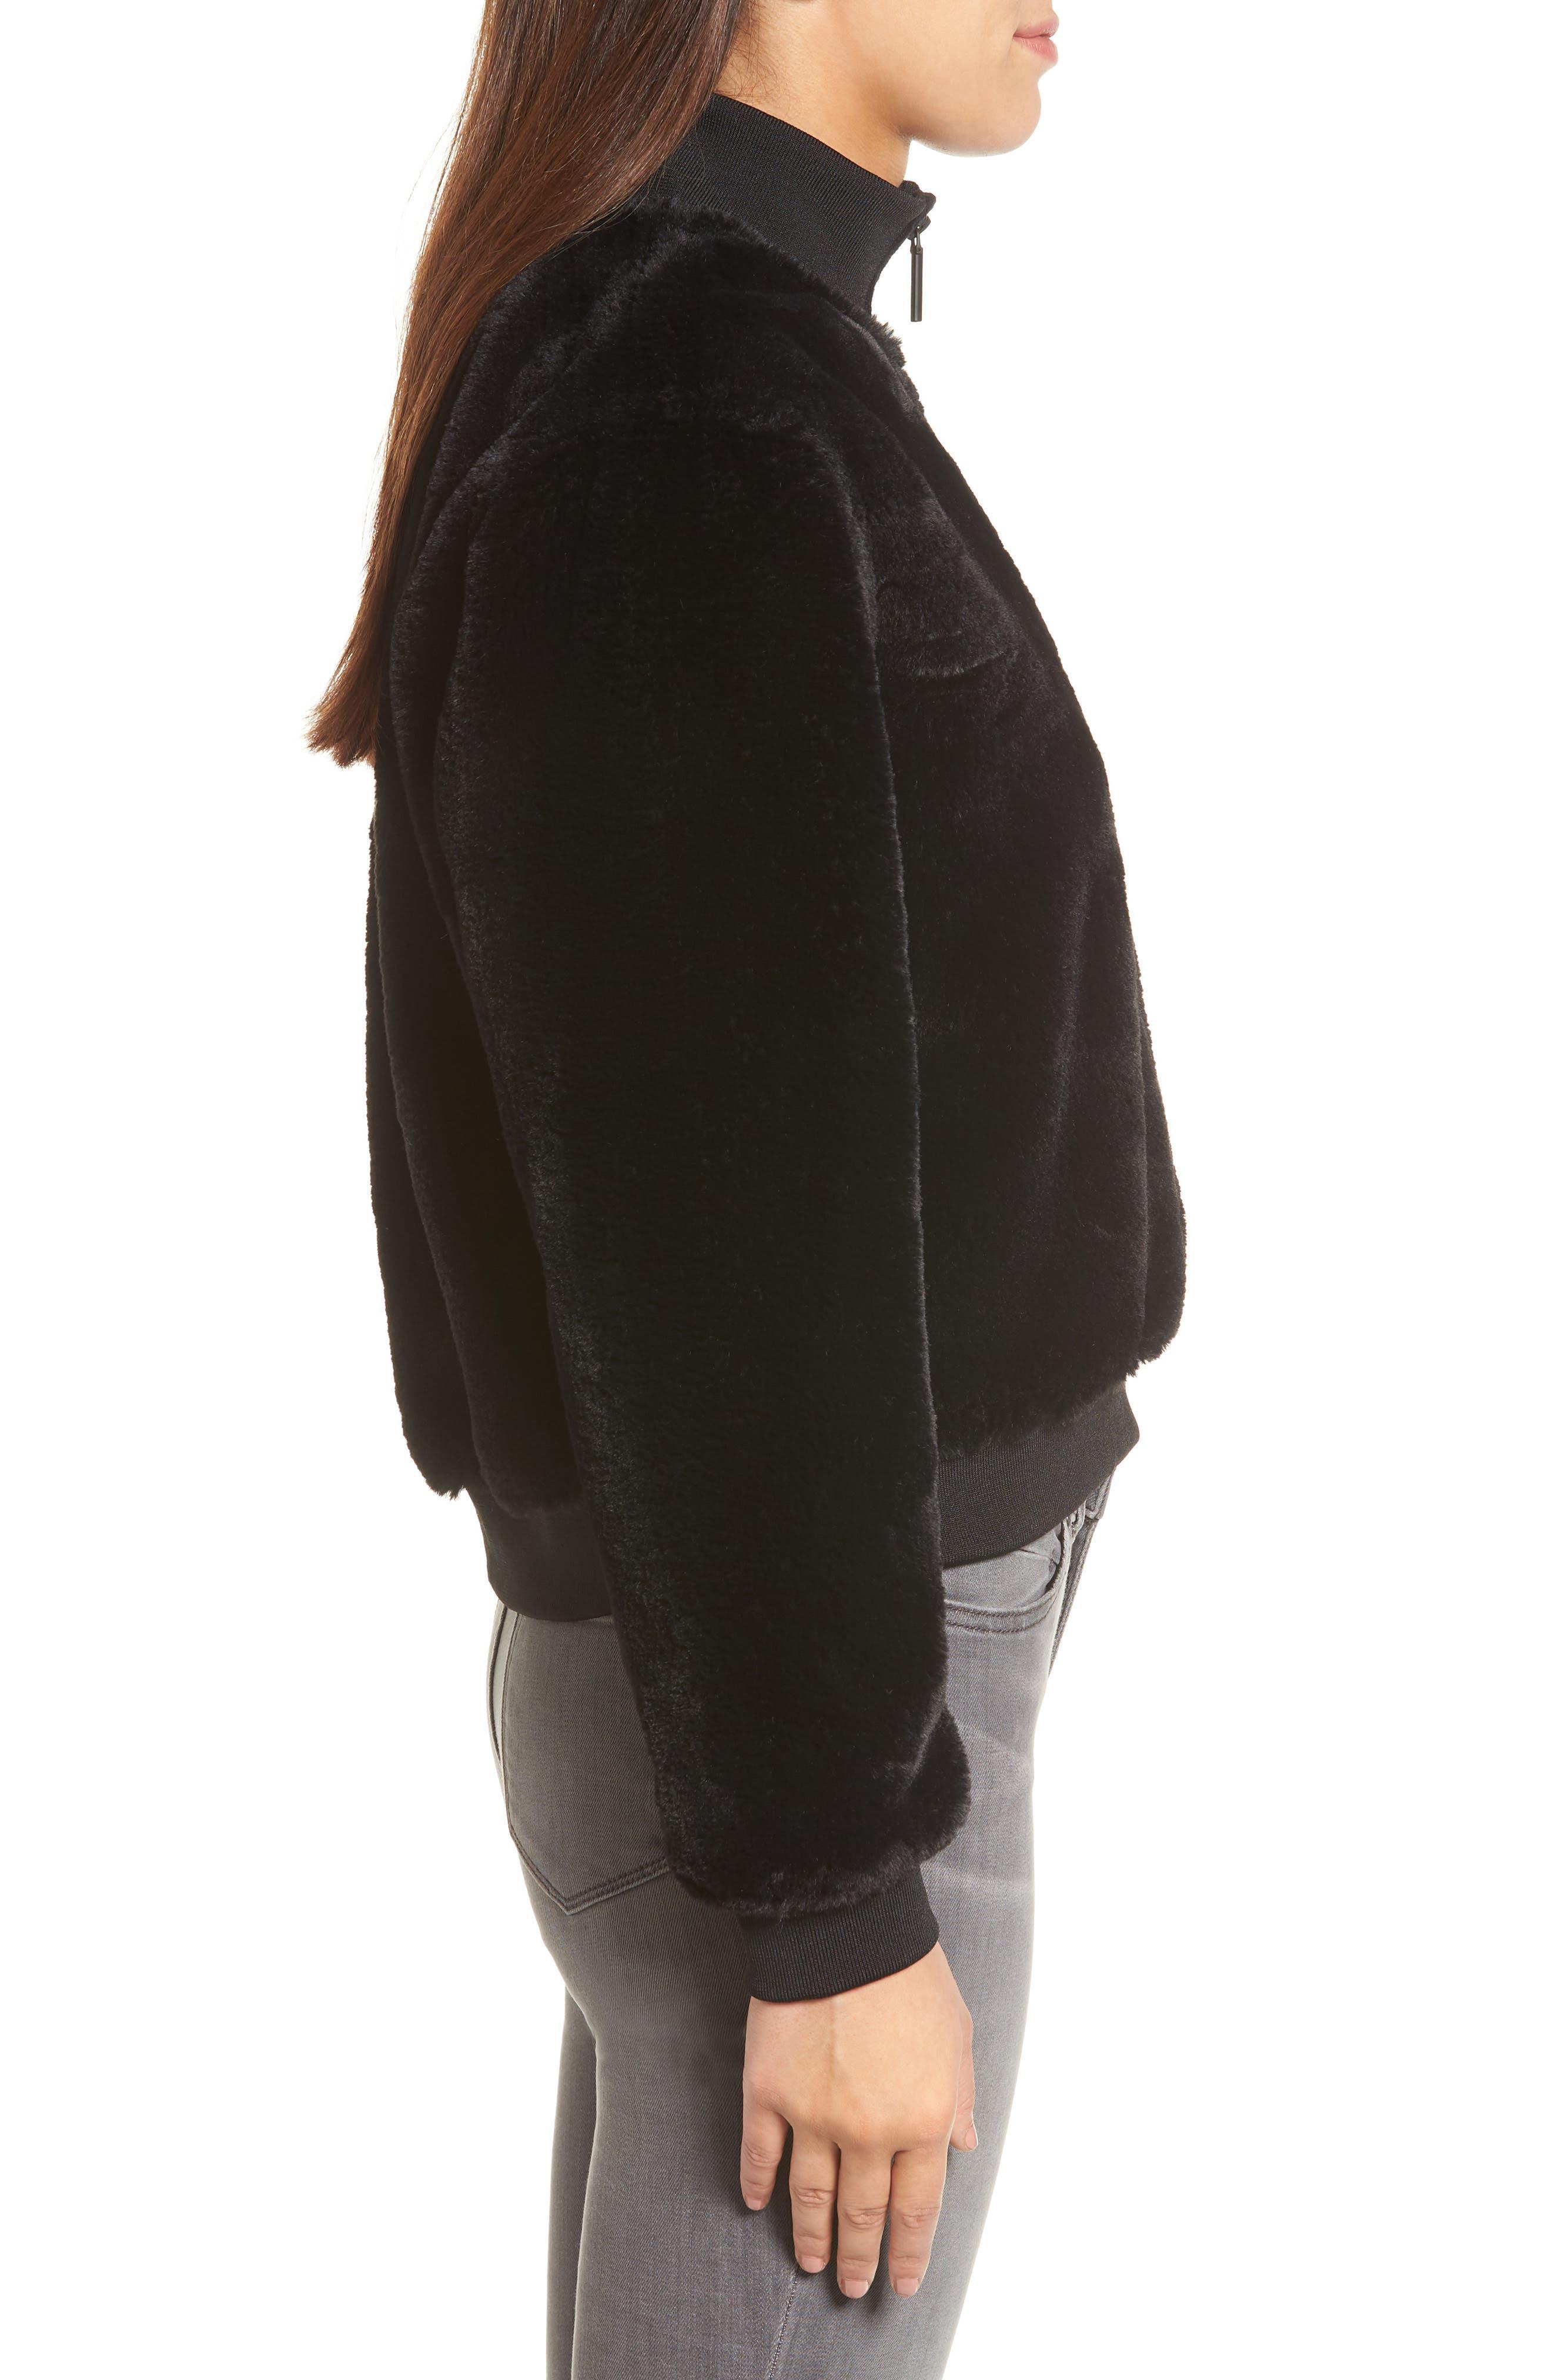 KENNETH COLE NEW YORK, Half-Zip Faux Fur Sweatshirt, Alternate thumbnail 3, color, BLACK